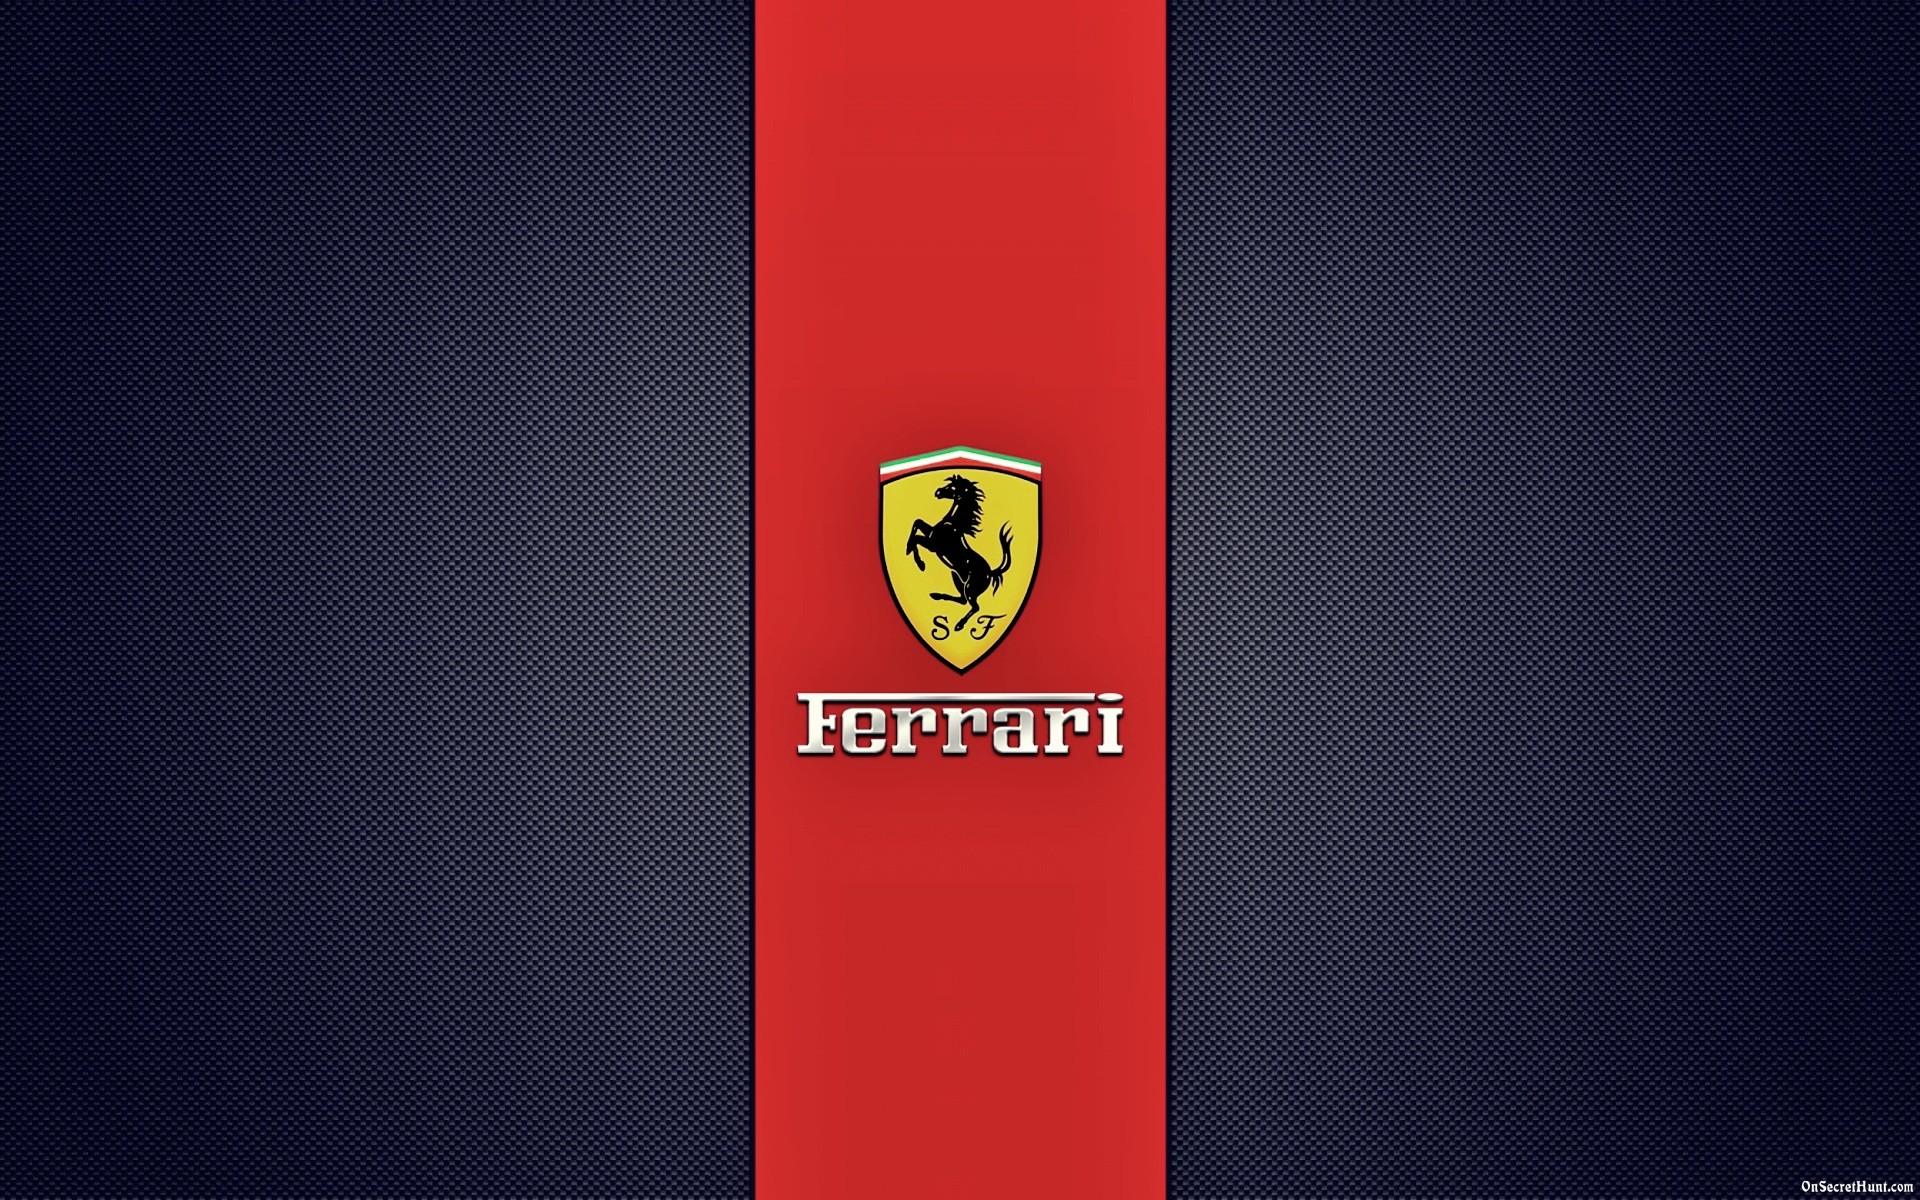 ferrari logo wallpaper 183��